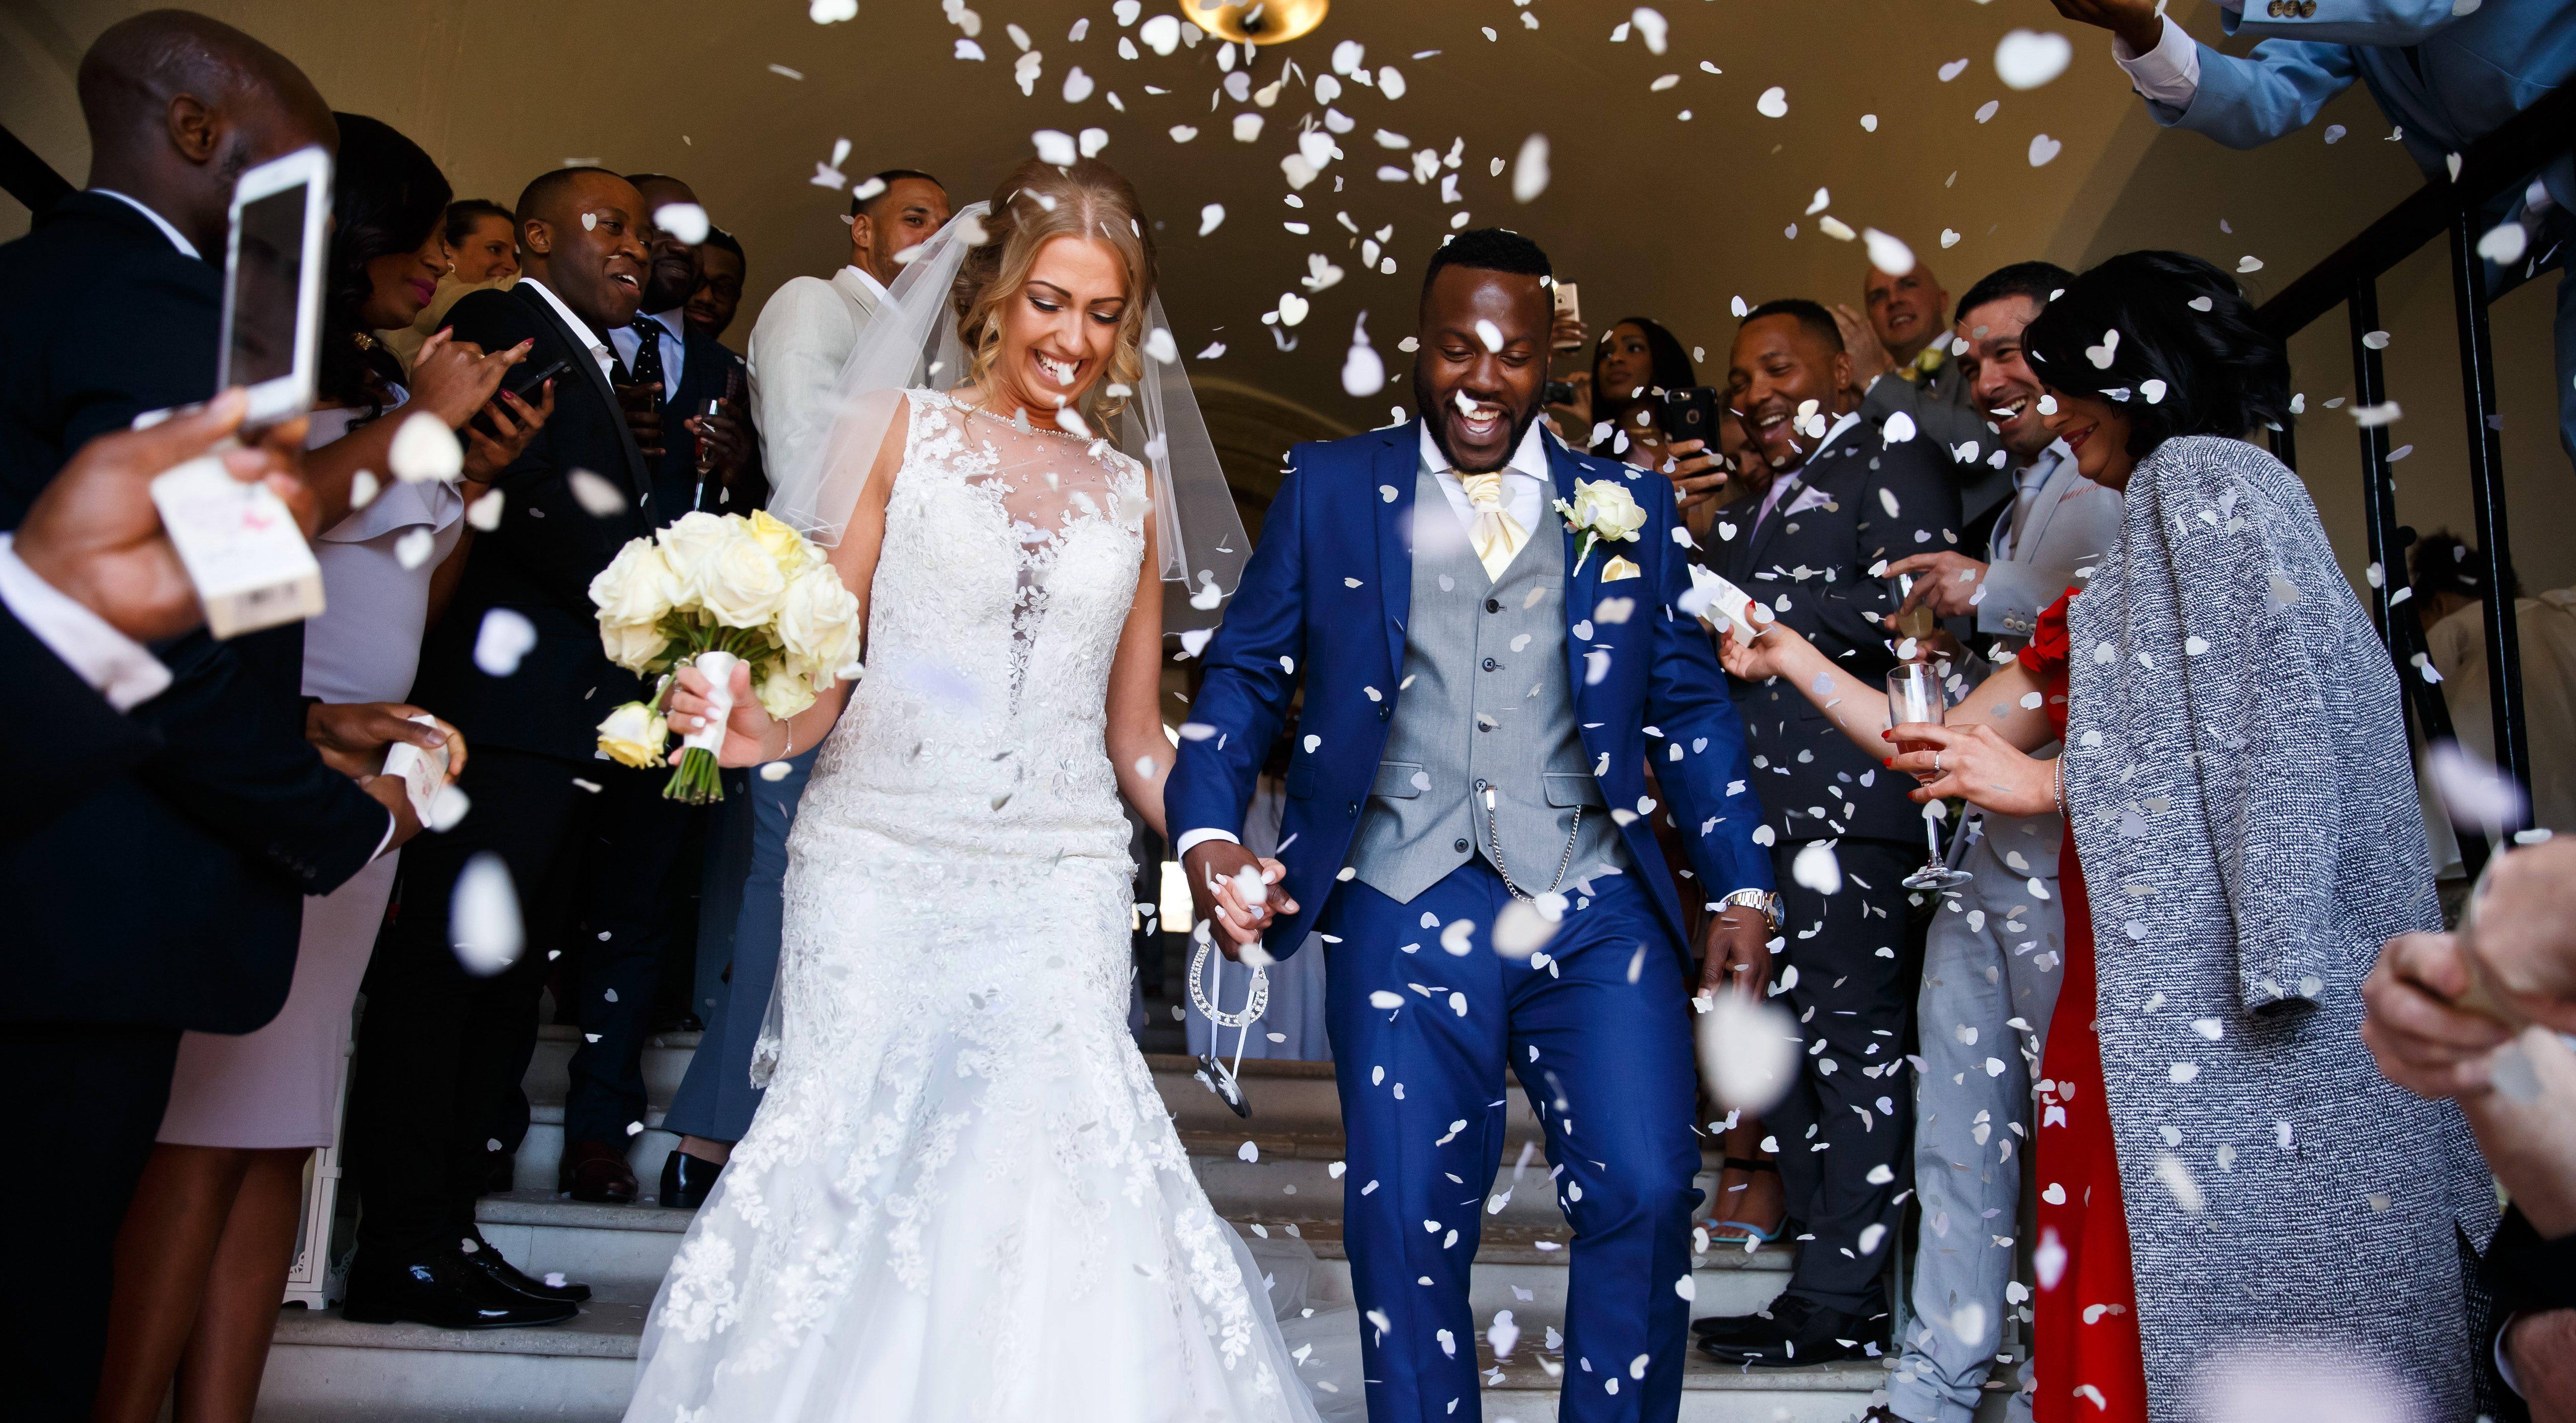 Farnham Castle Wedding. Surrey Wedding Photographer